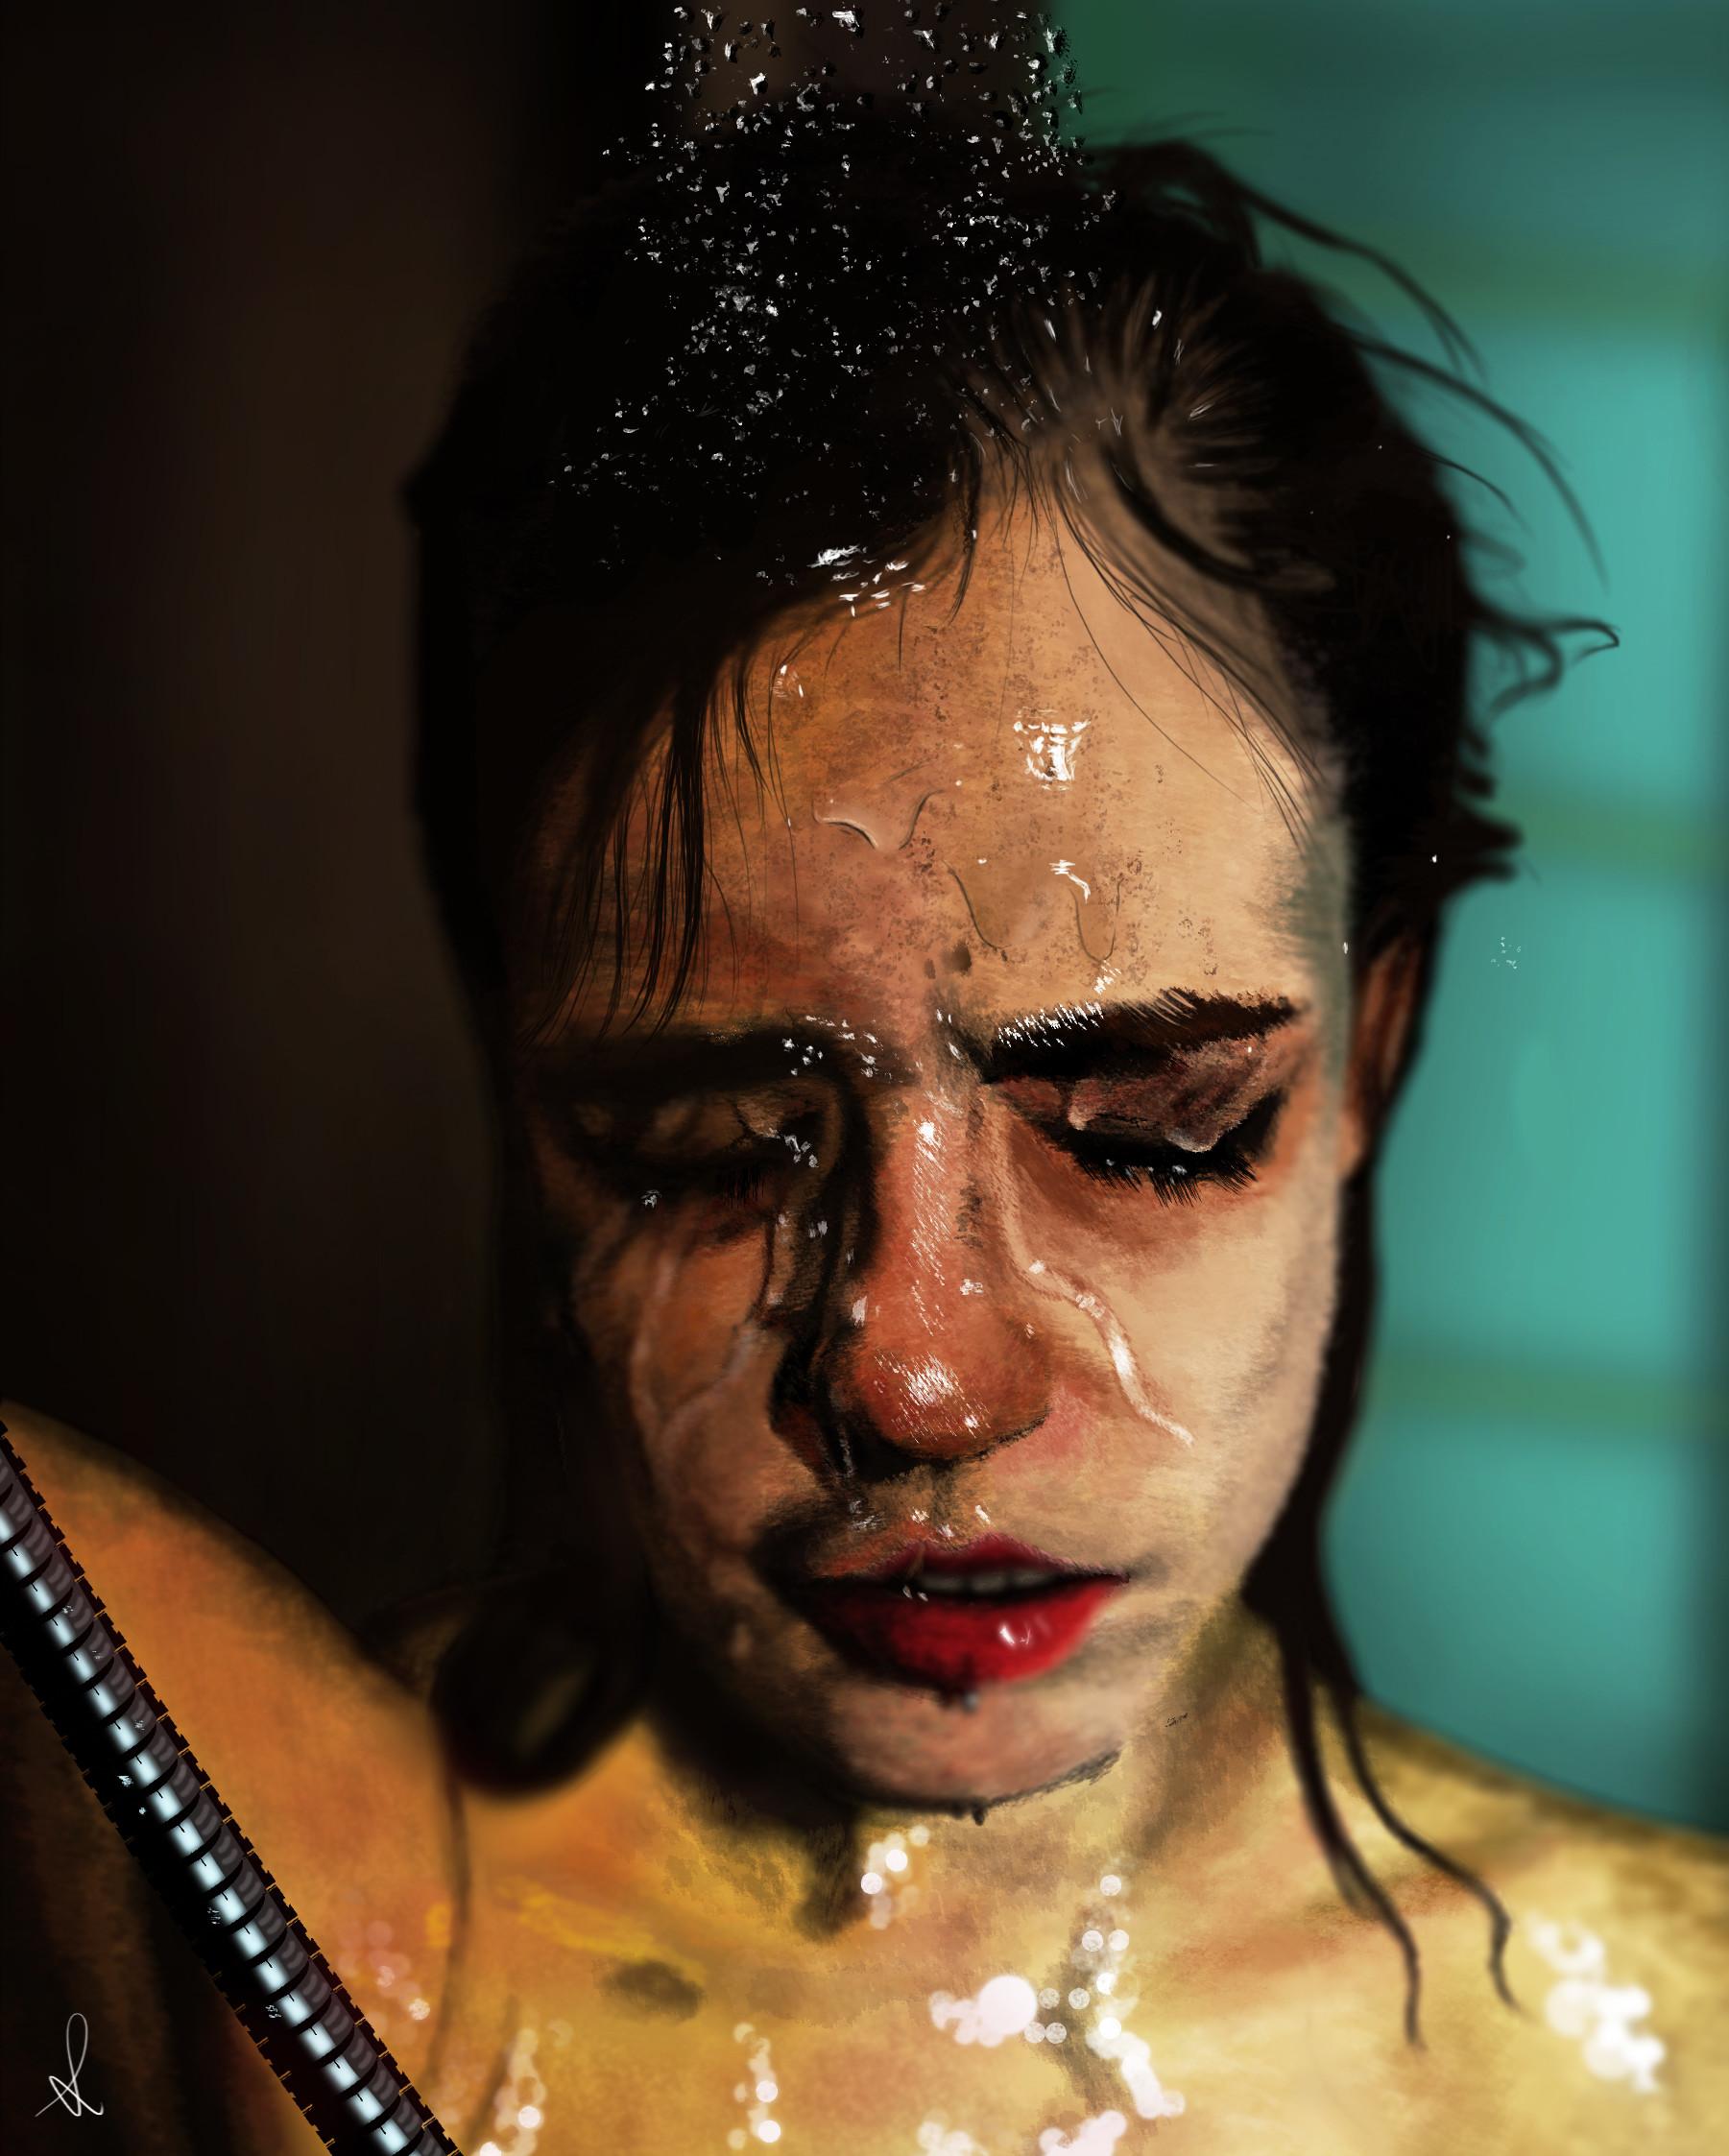 Artstation shower girl photoshop tutorial portrait david martnez shower girl digital portrait tutorial on photoshop baditri Choice Image